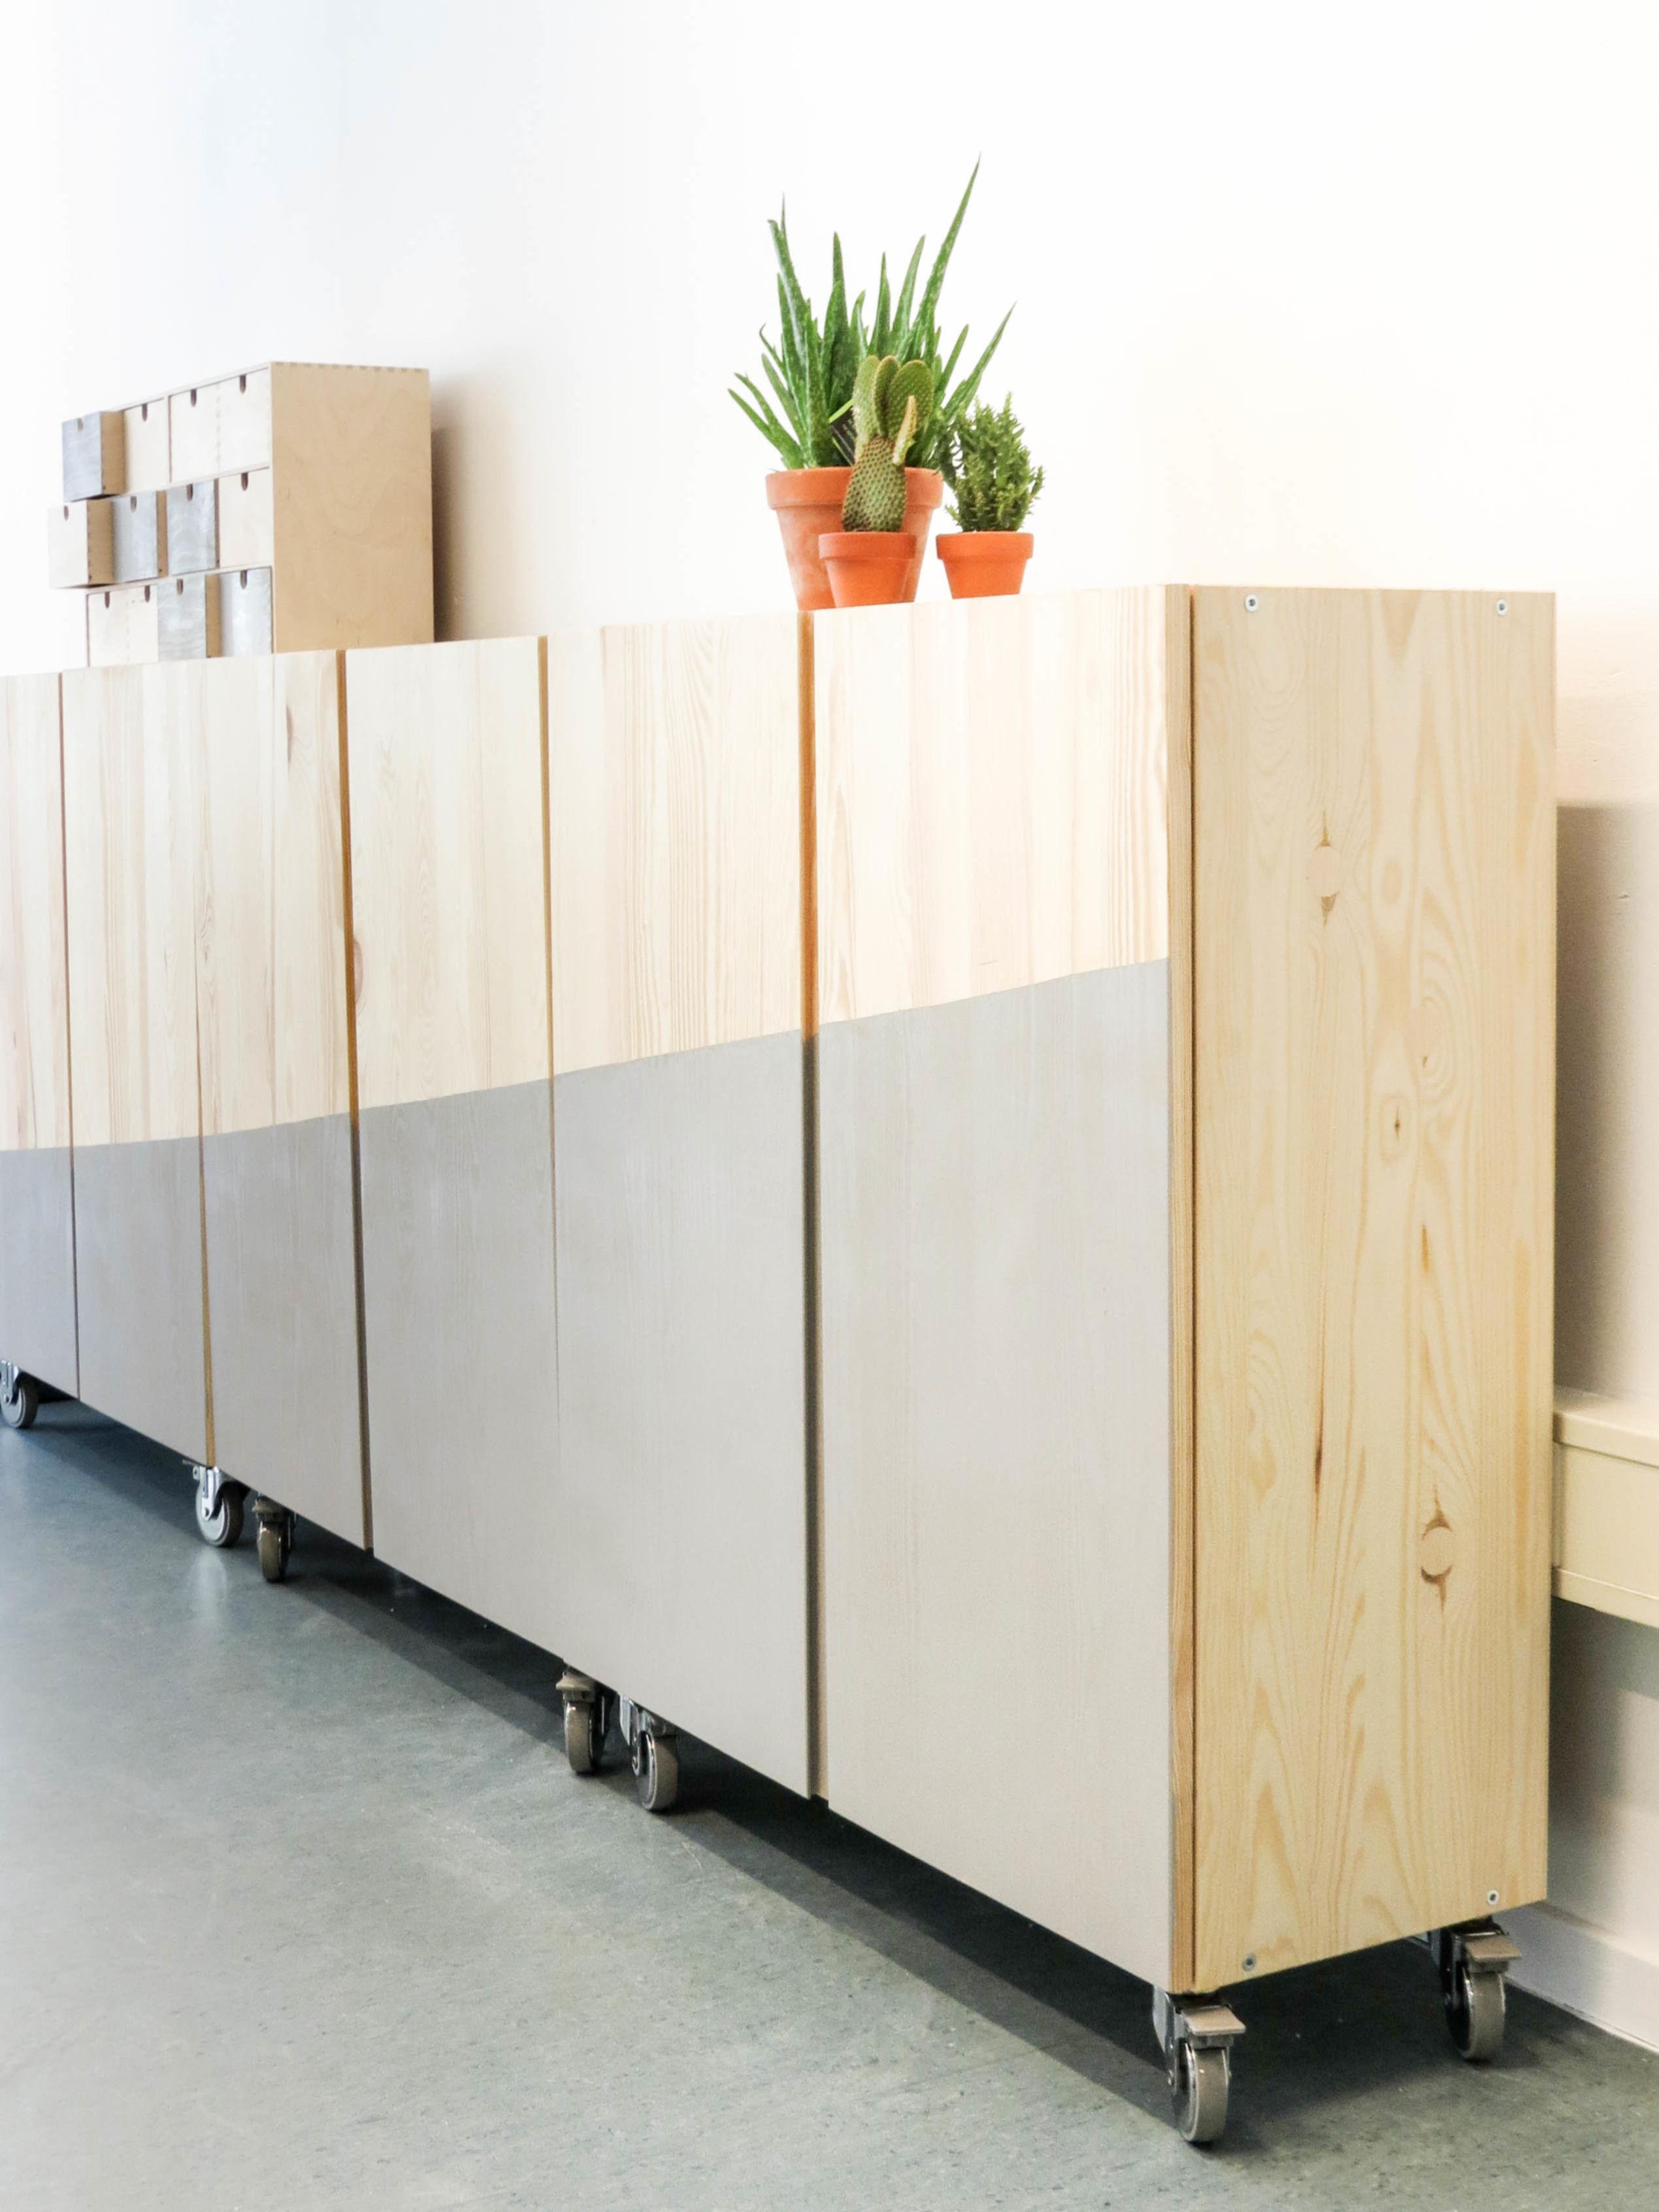 Wandplank Steigerhout Zwevend.Praxis Wandplank Cool Wandplank Room Van Housedoctor Maakt Plaats